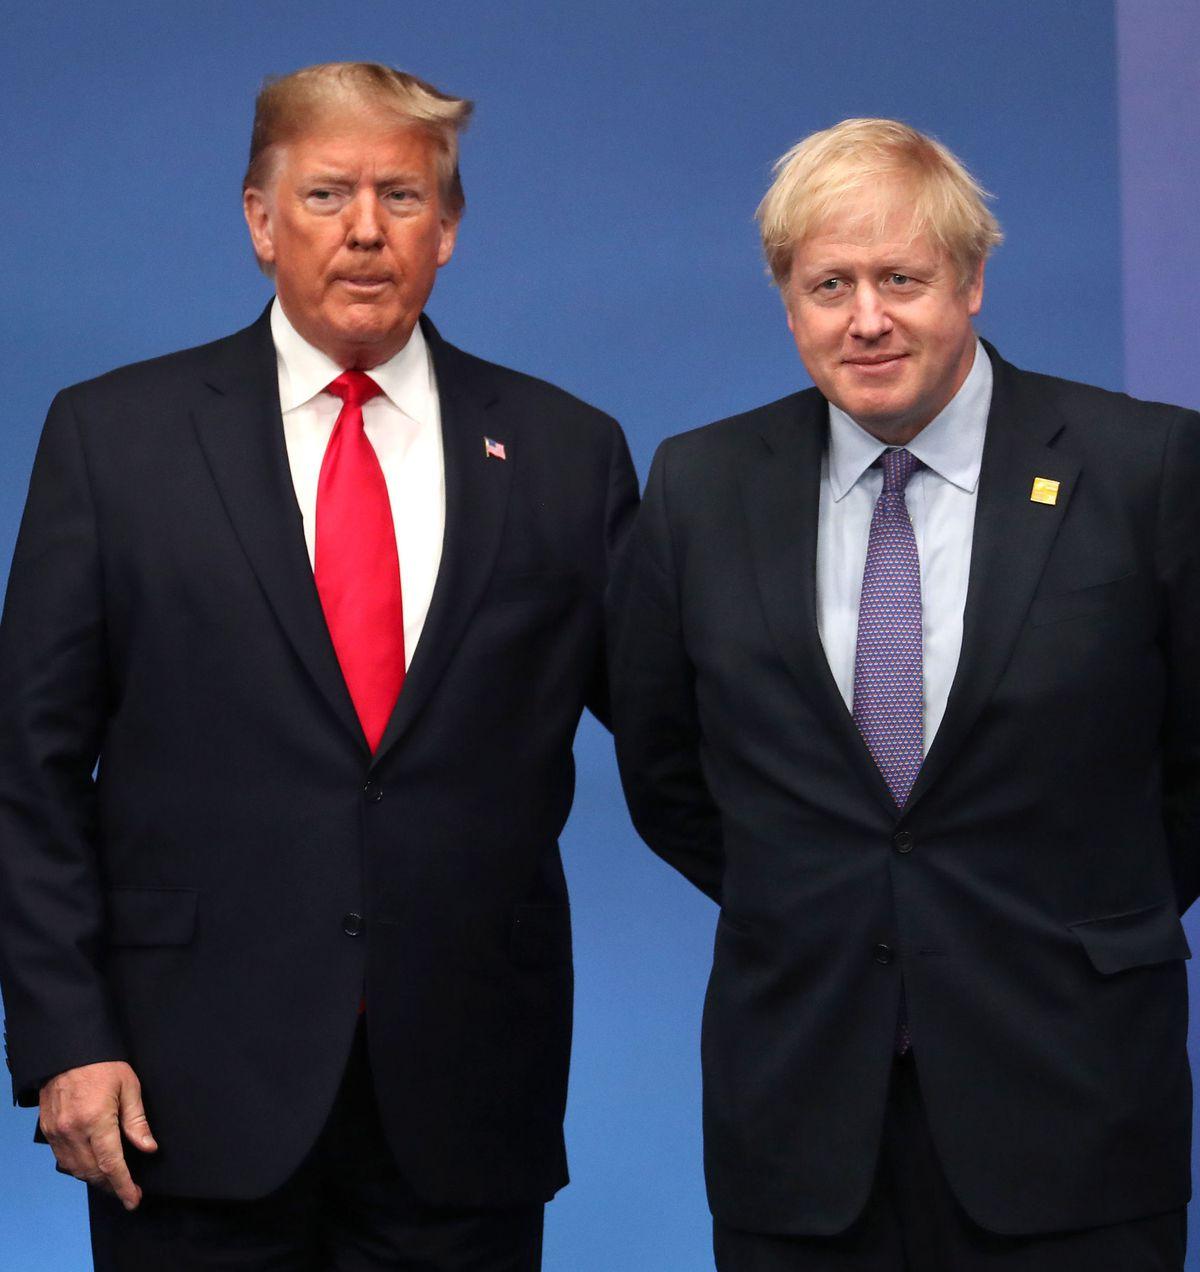 US President Donald Trump and Prime Minister Boris Johnson